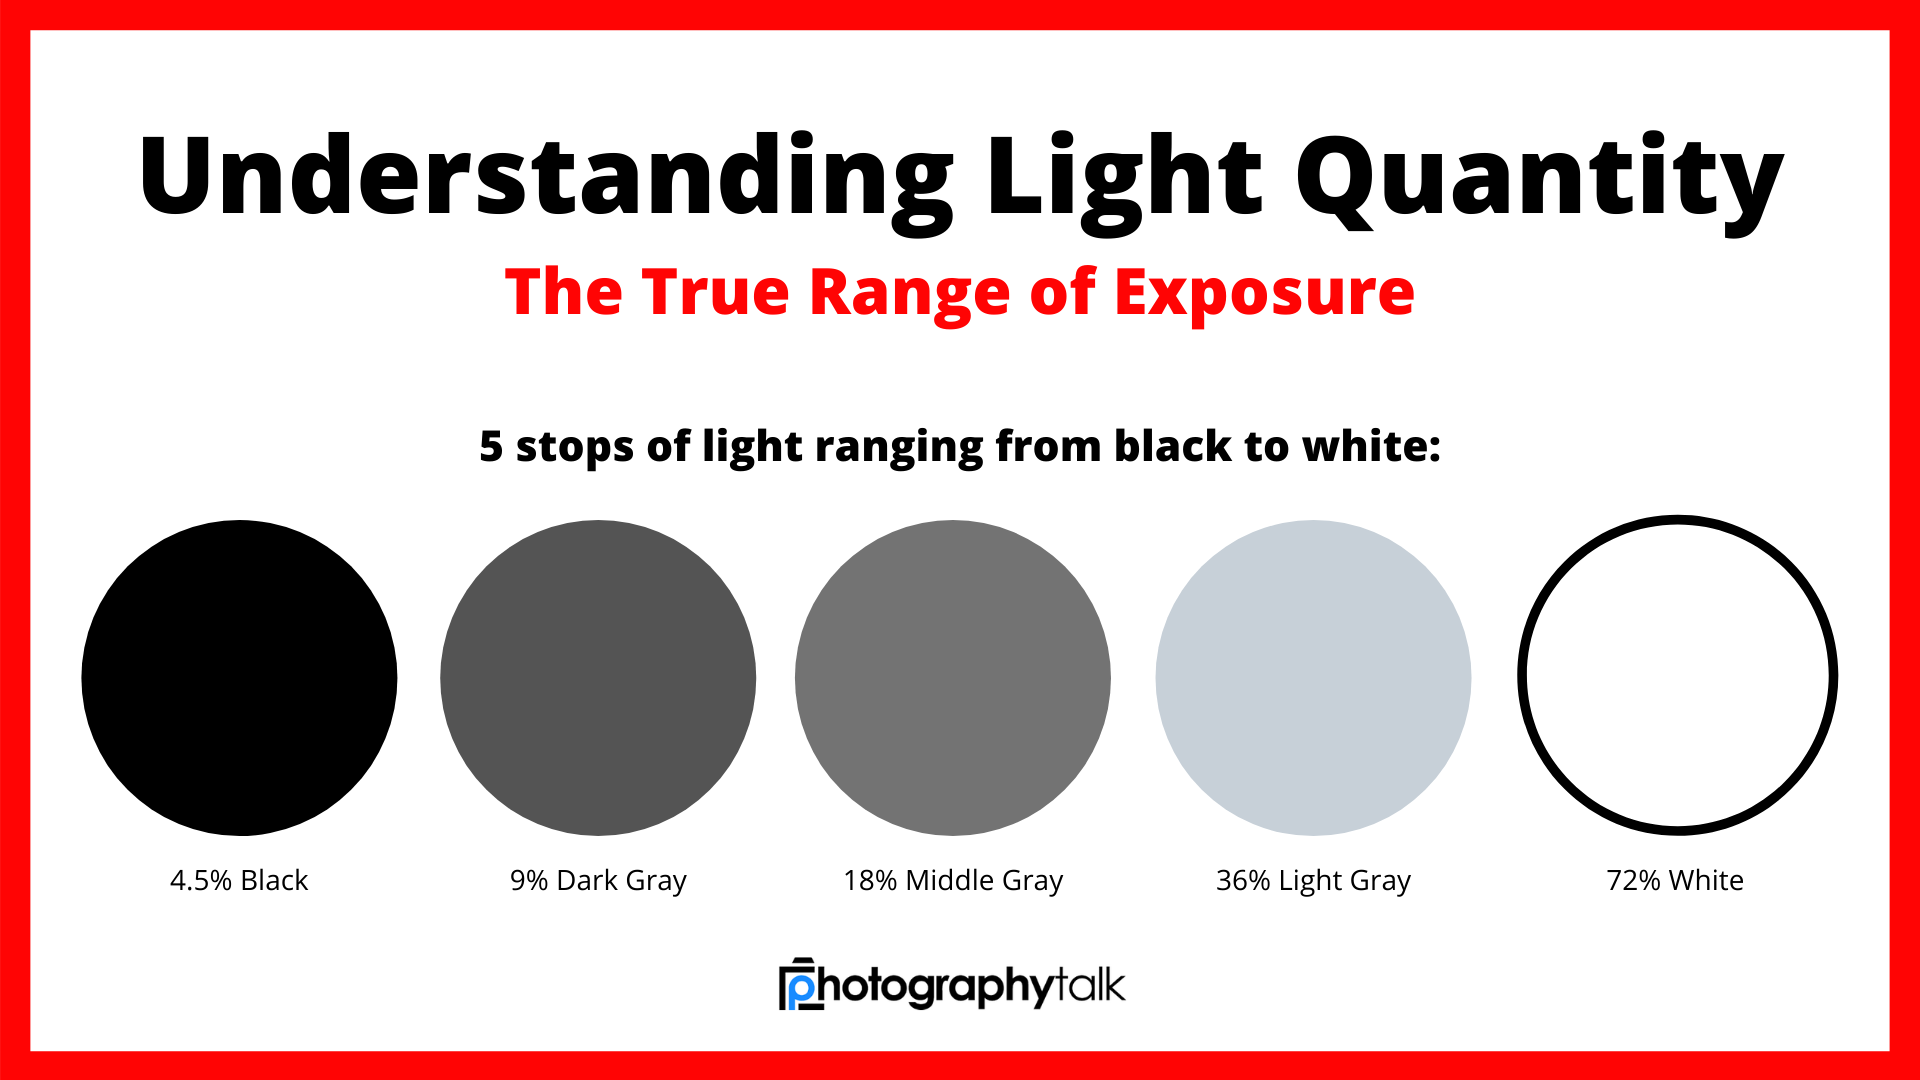 range of exposure image